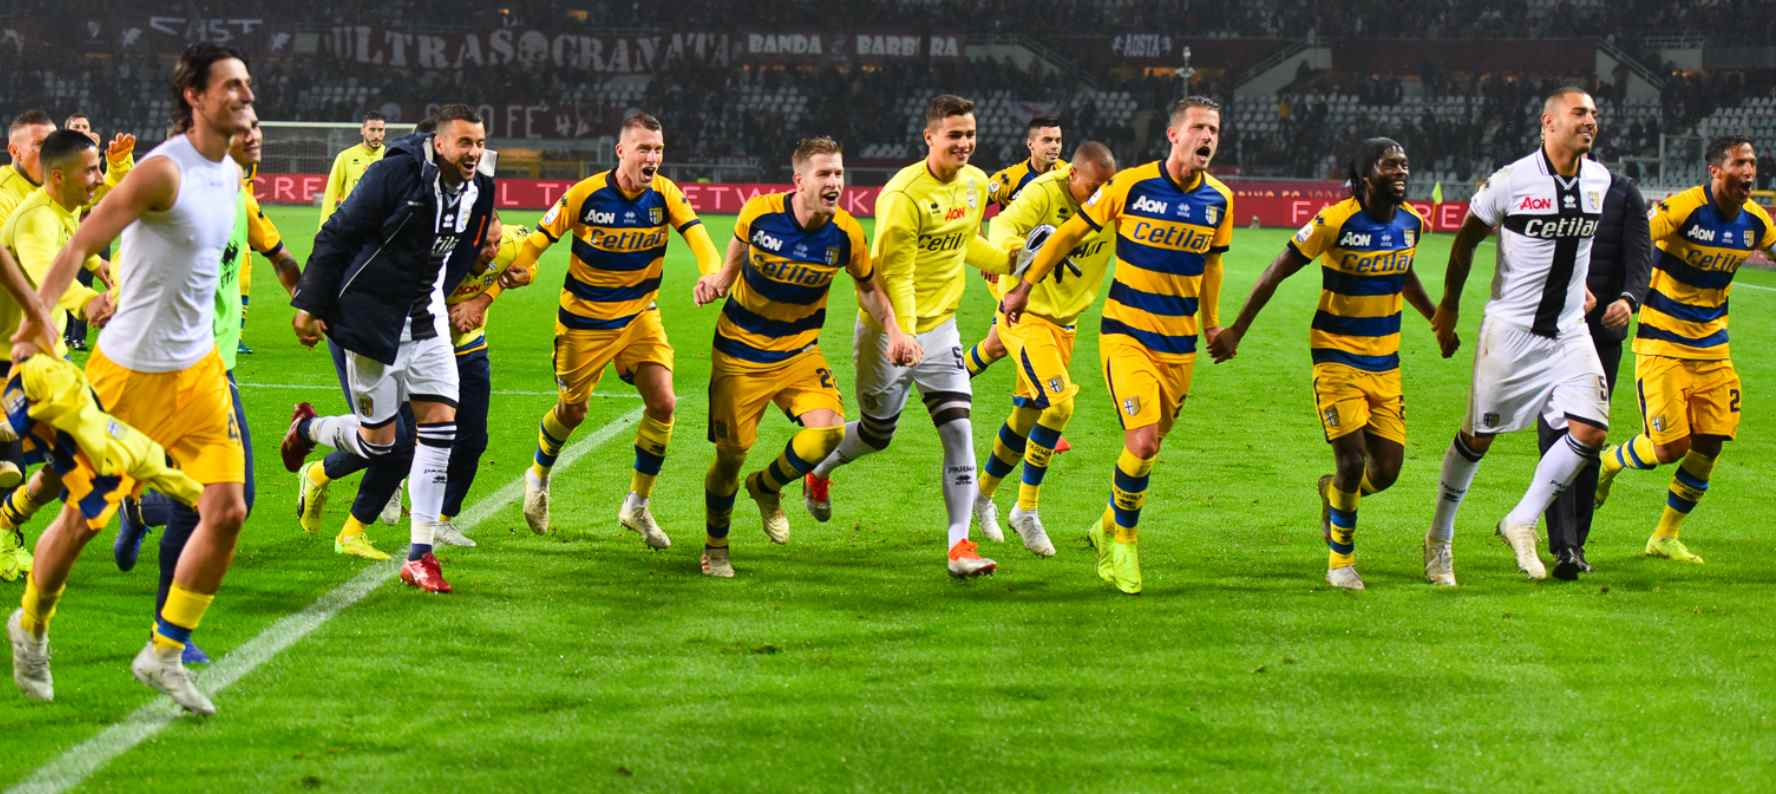 torino parma esultanza finale - Stadio Ennio Tardini Parma